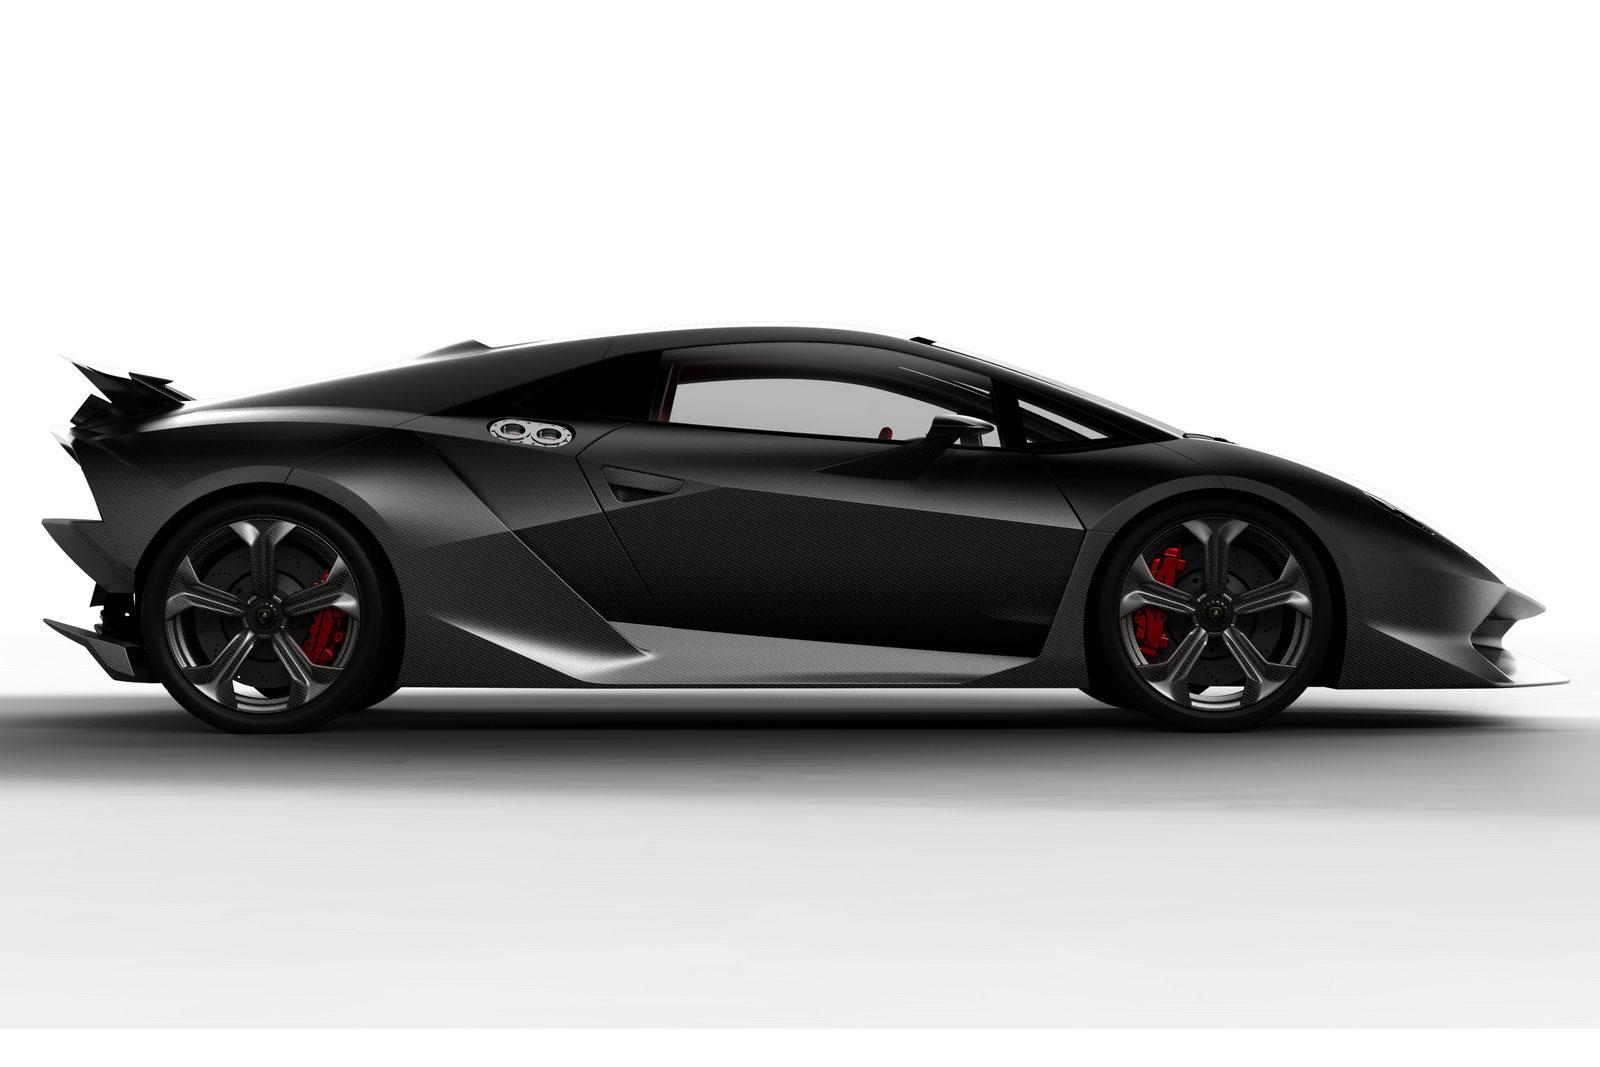 Lamborghini clipart #15